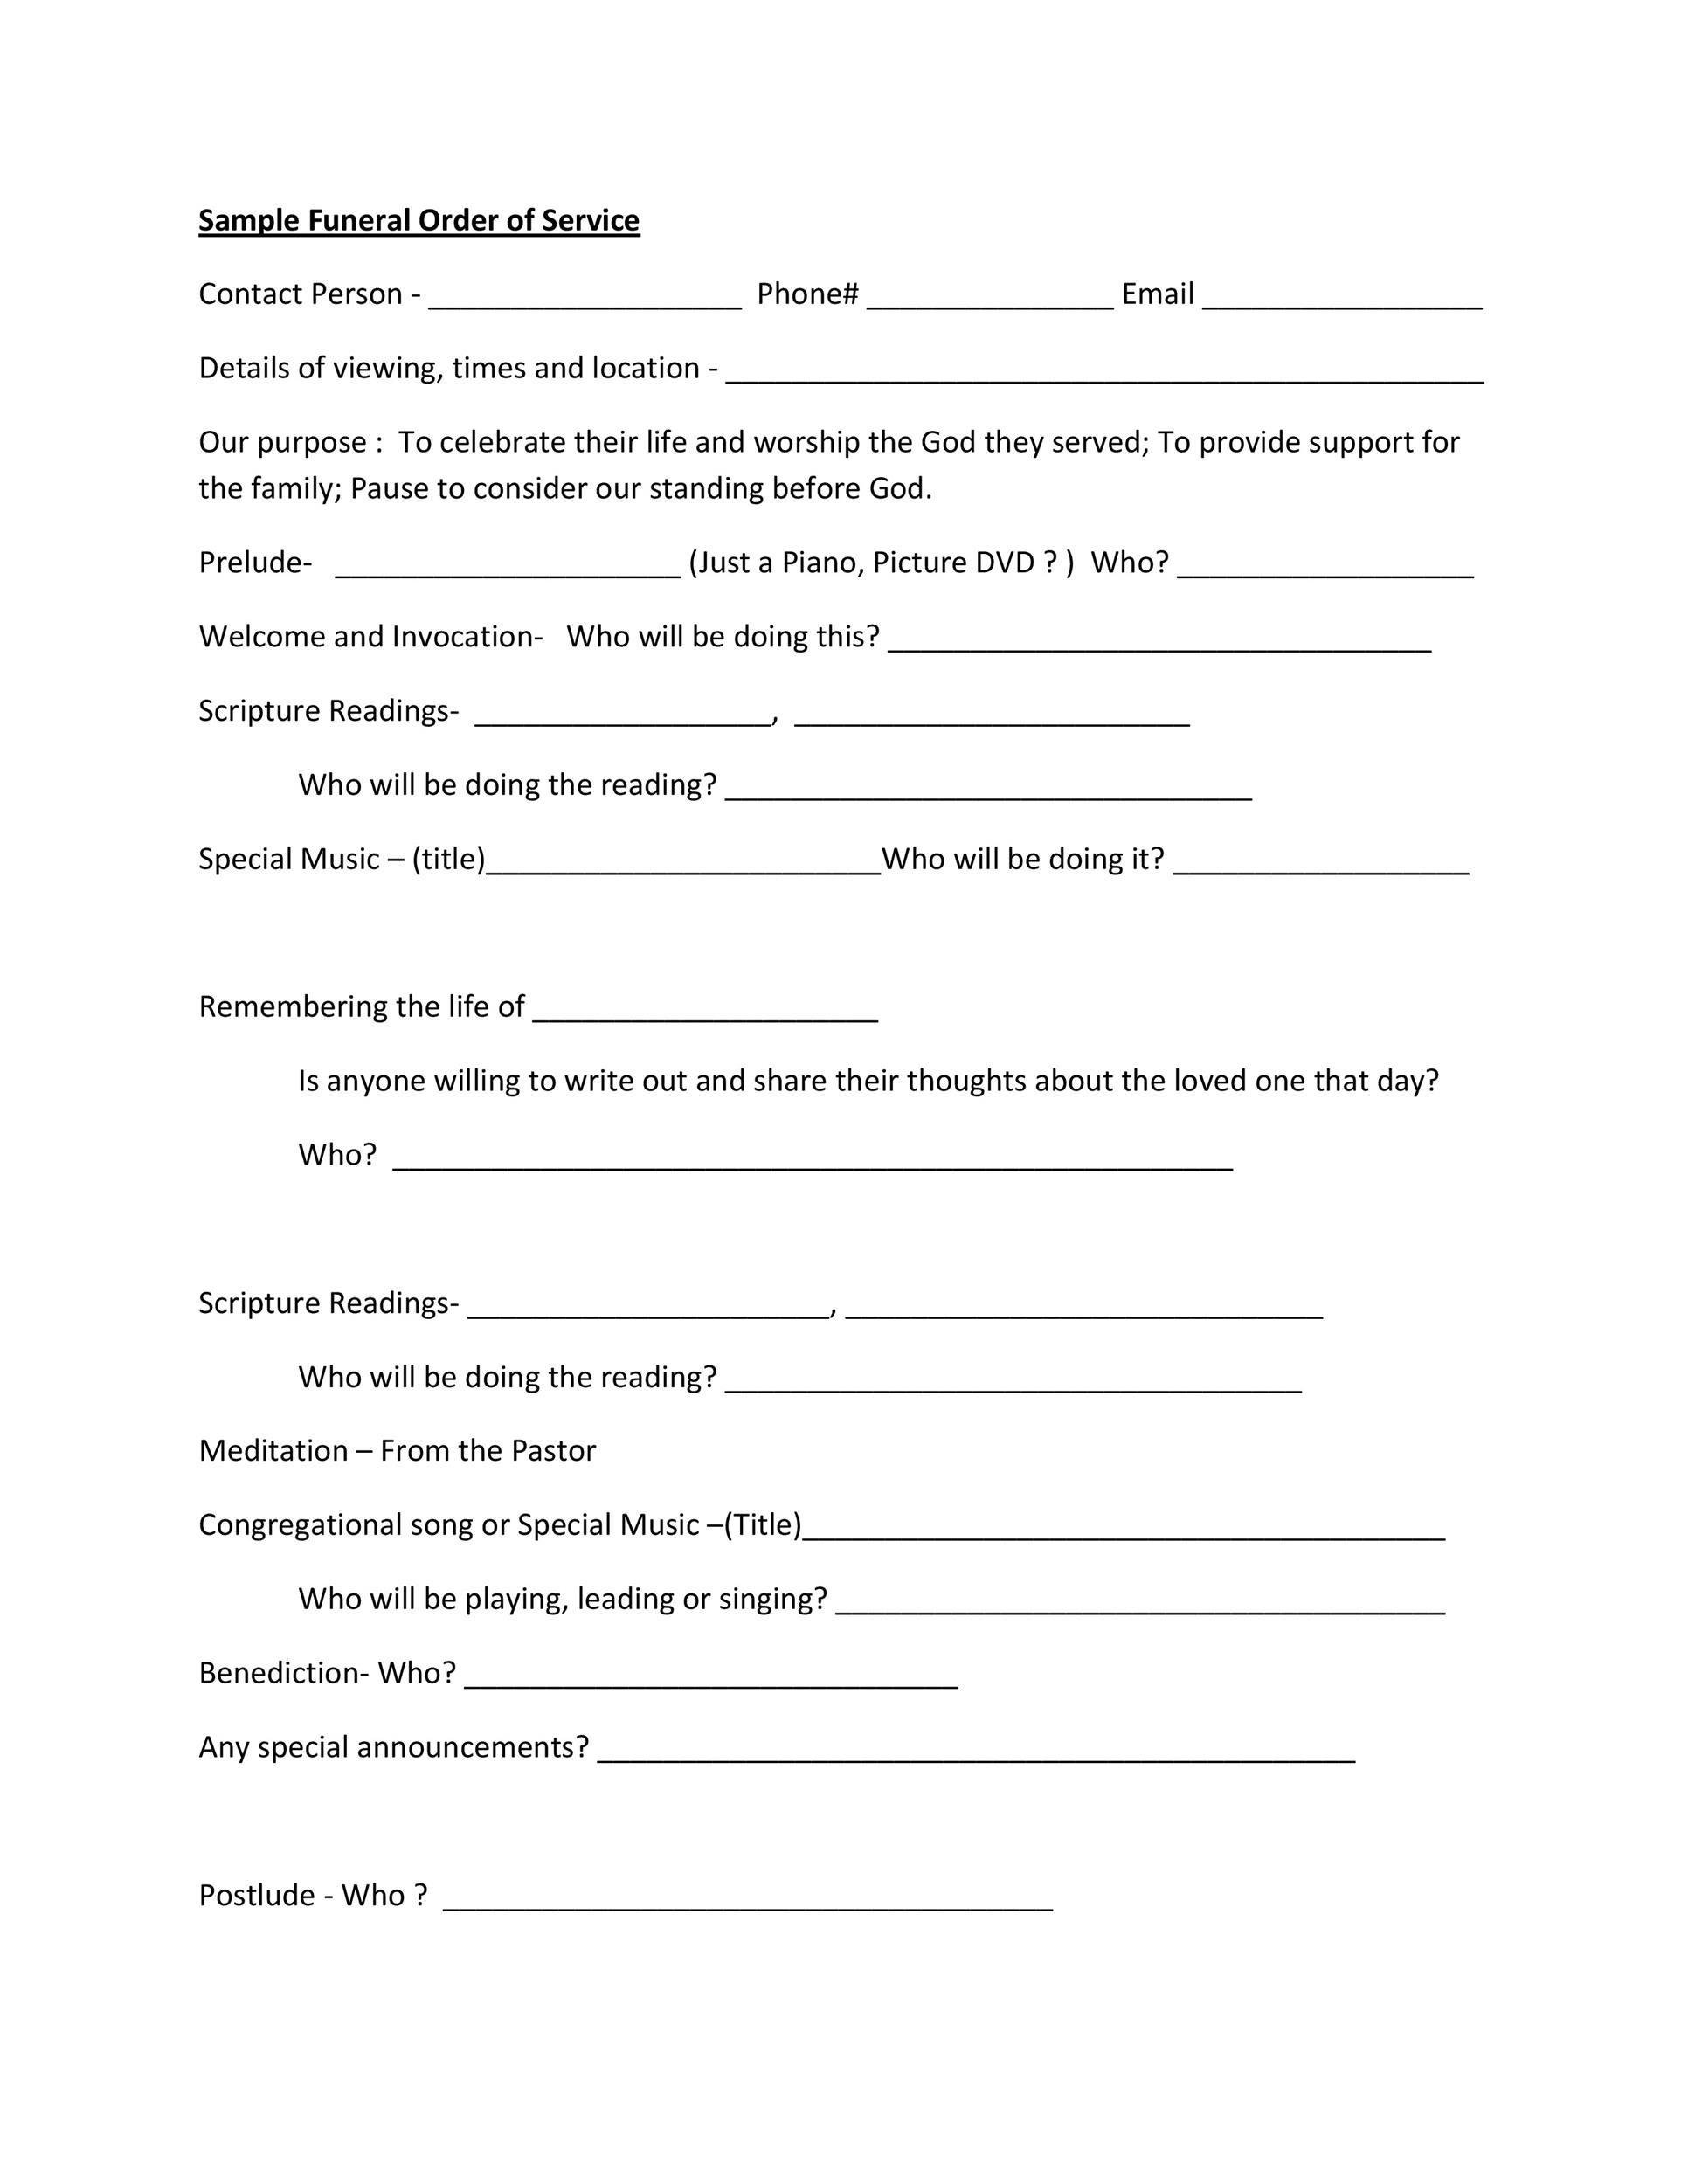 Free funeral program template 13